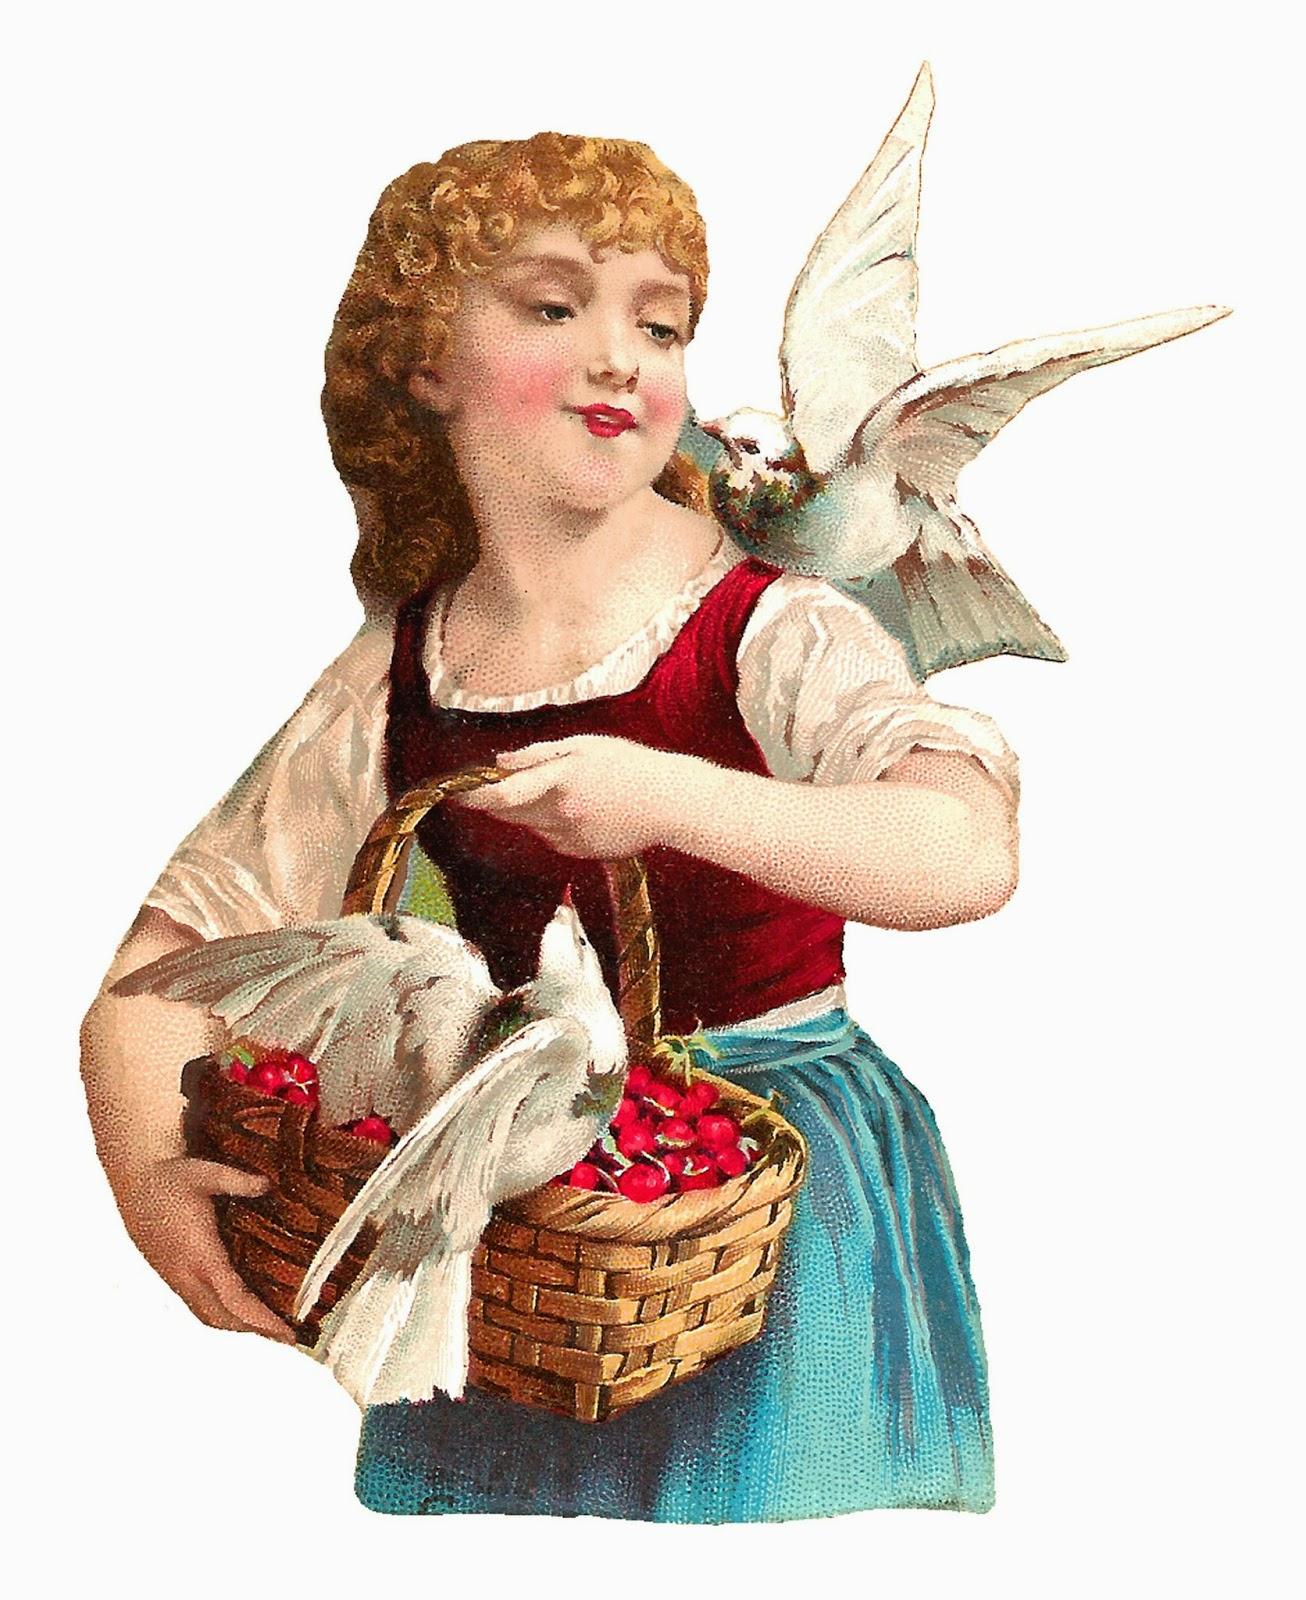 http://2.bp.blogspot.com/-BhNK83RHWjA/VKsmVmbHIKI/AAAAAAAAUyQ/A-rZ5ndnJWo/s1600/woman_w_doves_cherry_basket_scrap_gm.jpg